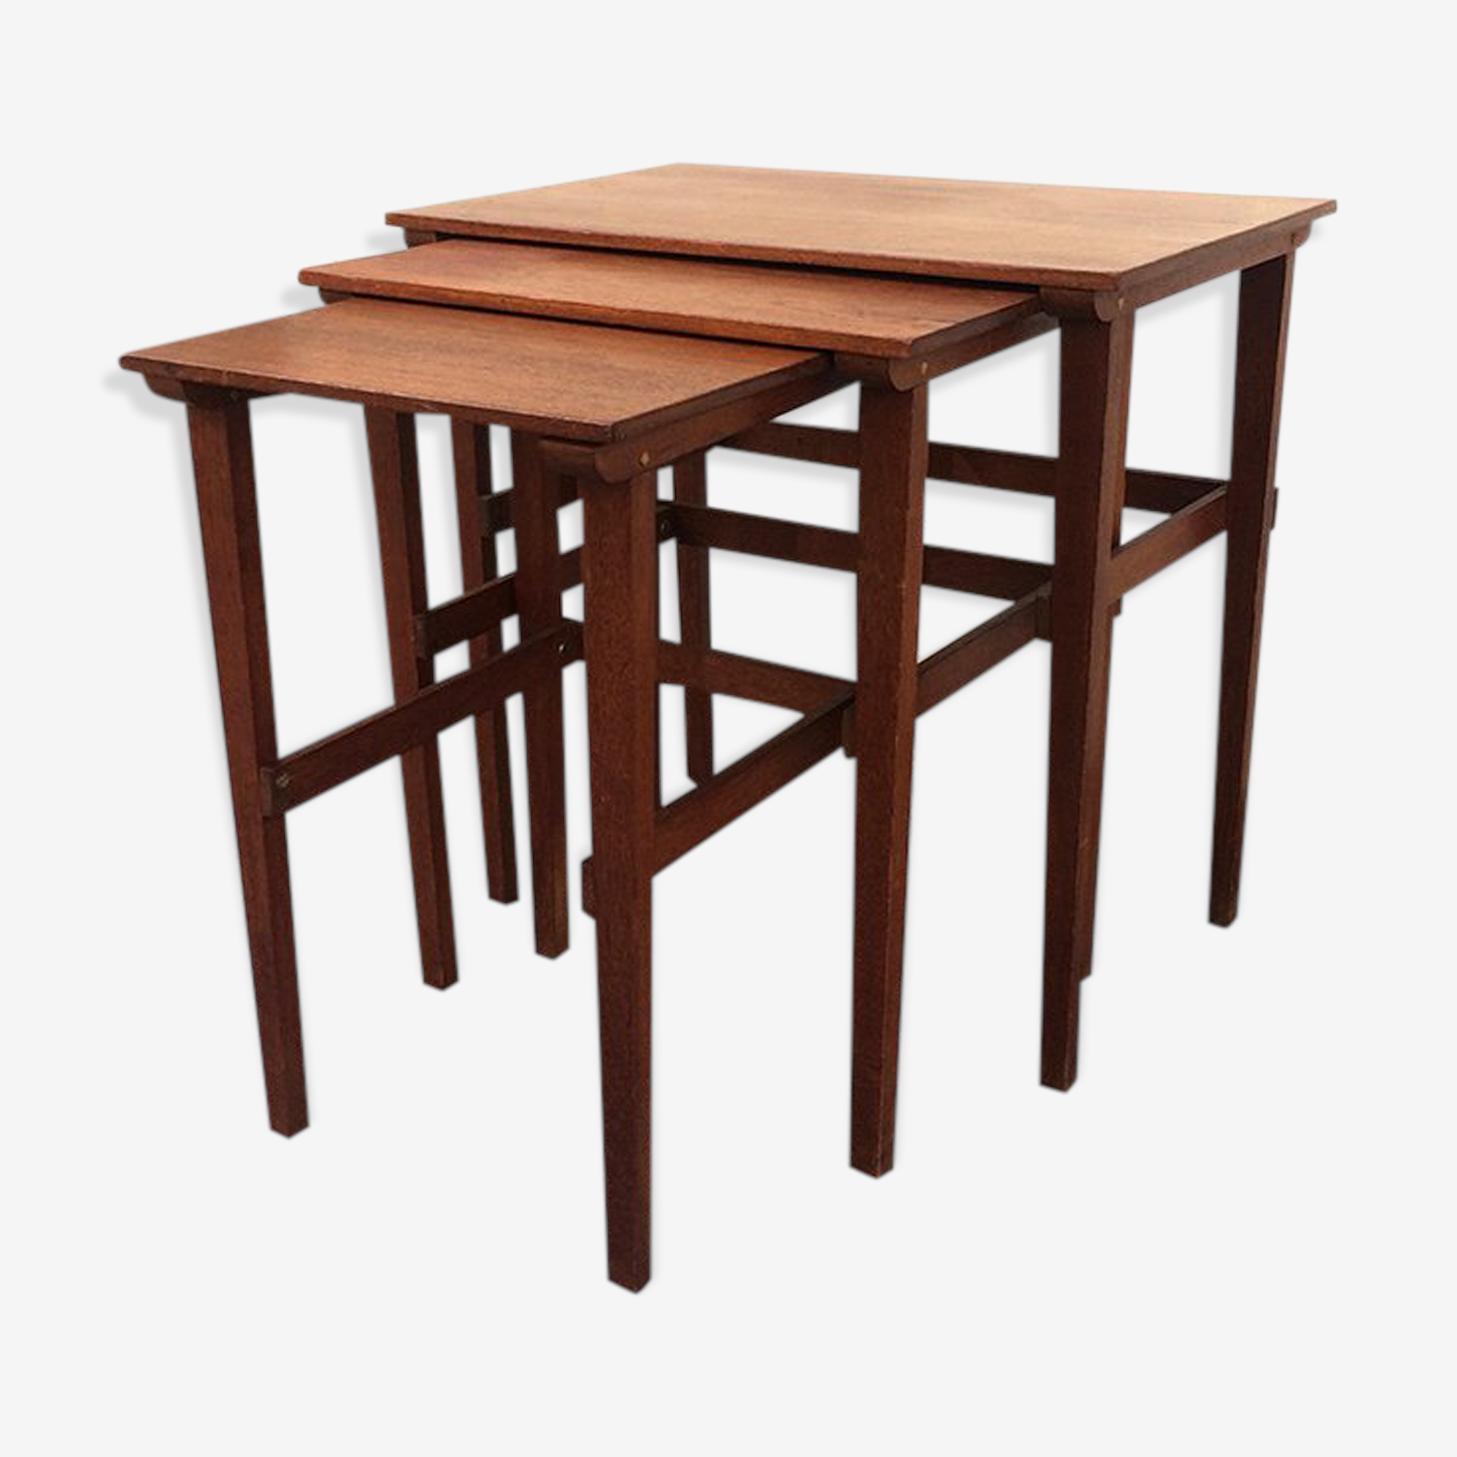 Tables gigognes style scandinave en bois 1960